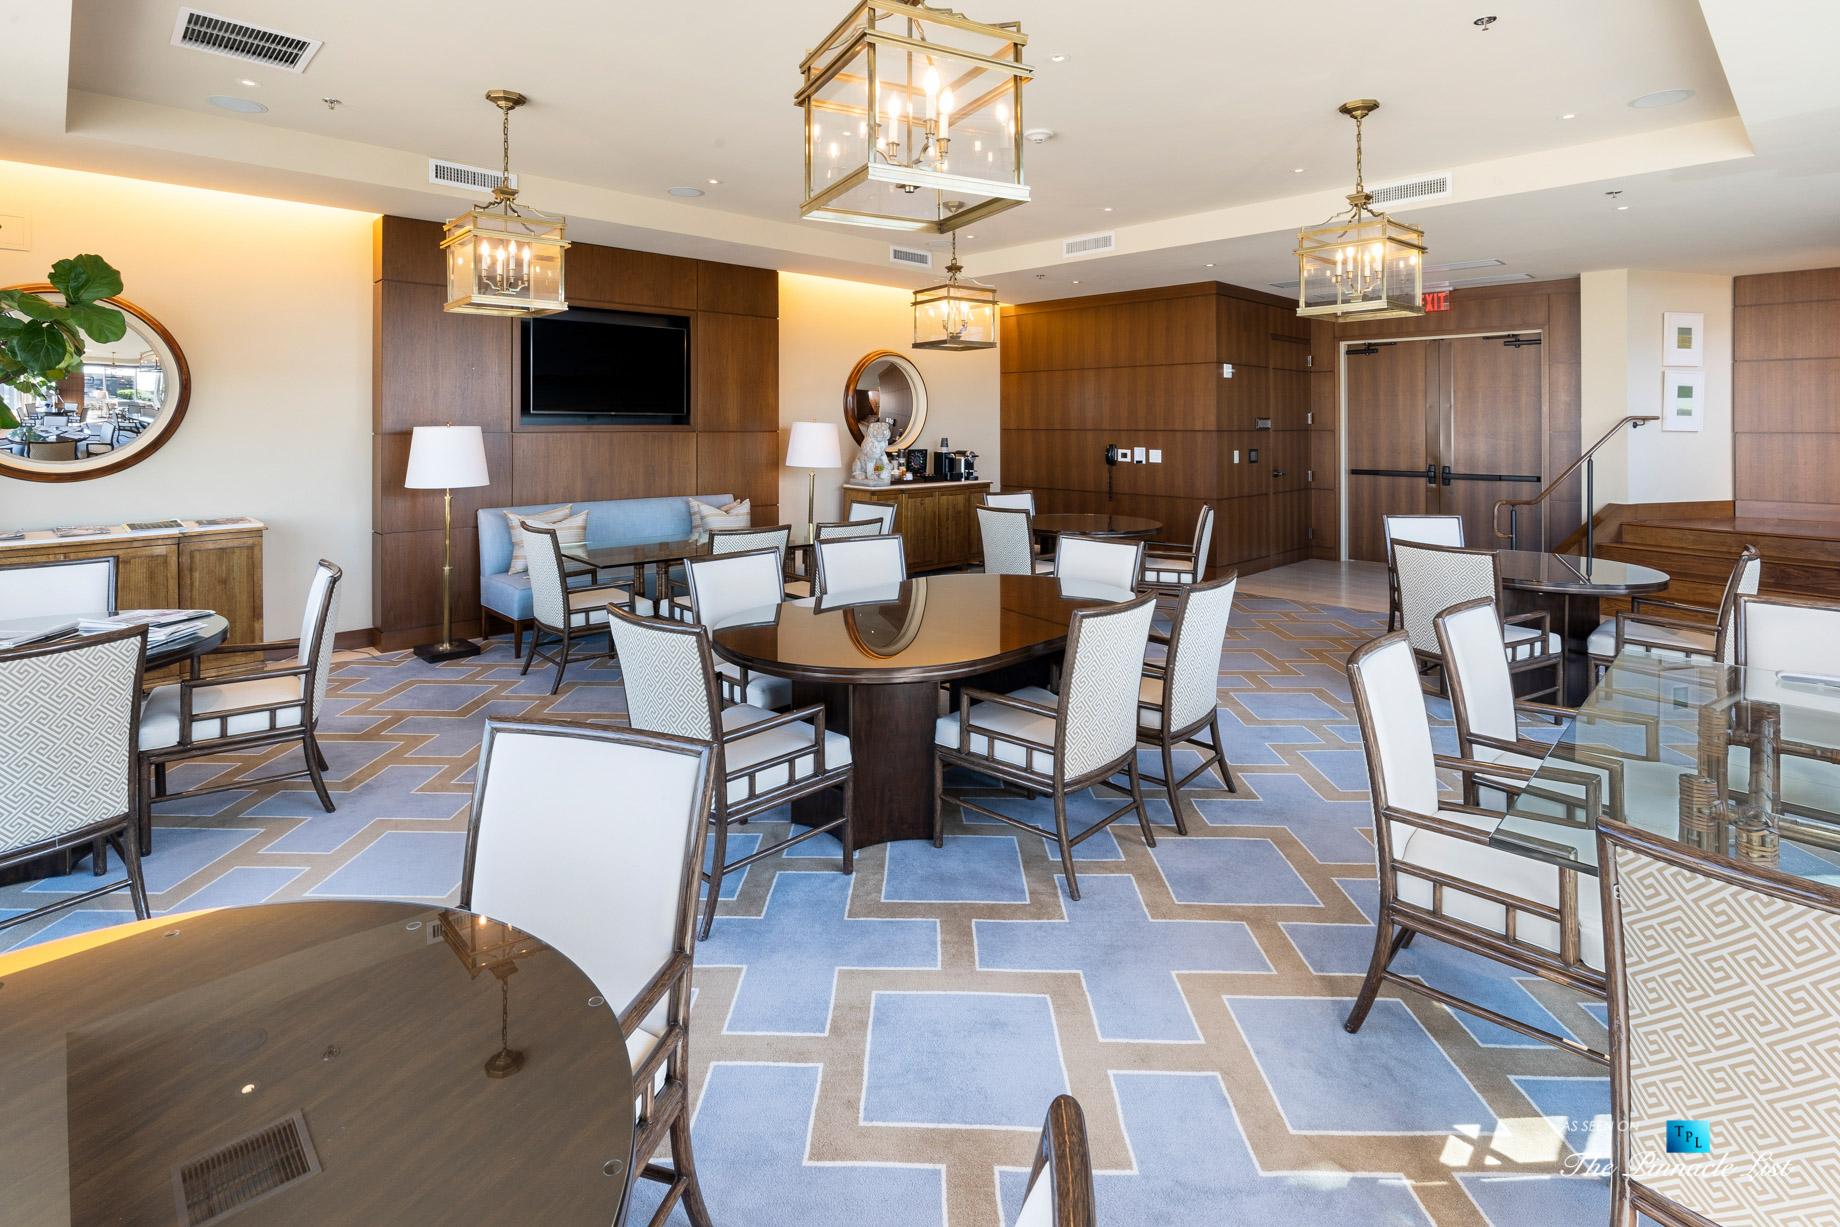 3630 Peachtree Rd NE, Unit 2307, Atlanta, GA, USA – Apartment Amenities Room – Luxury Real Estate – Ritz-Carlton Residences Buckhead